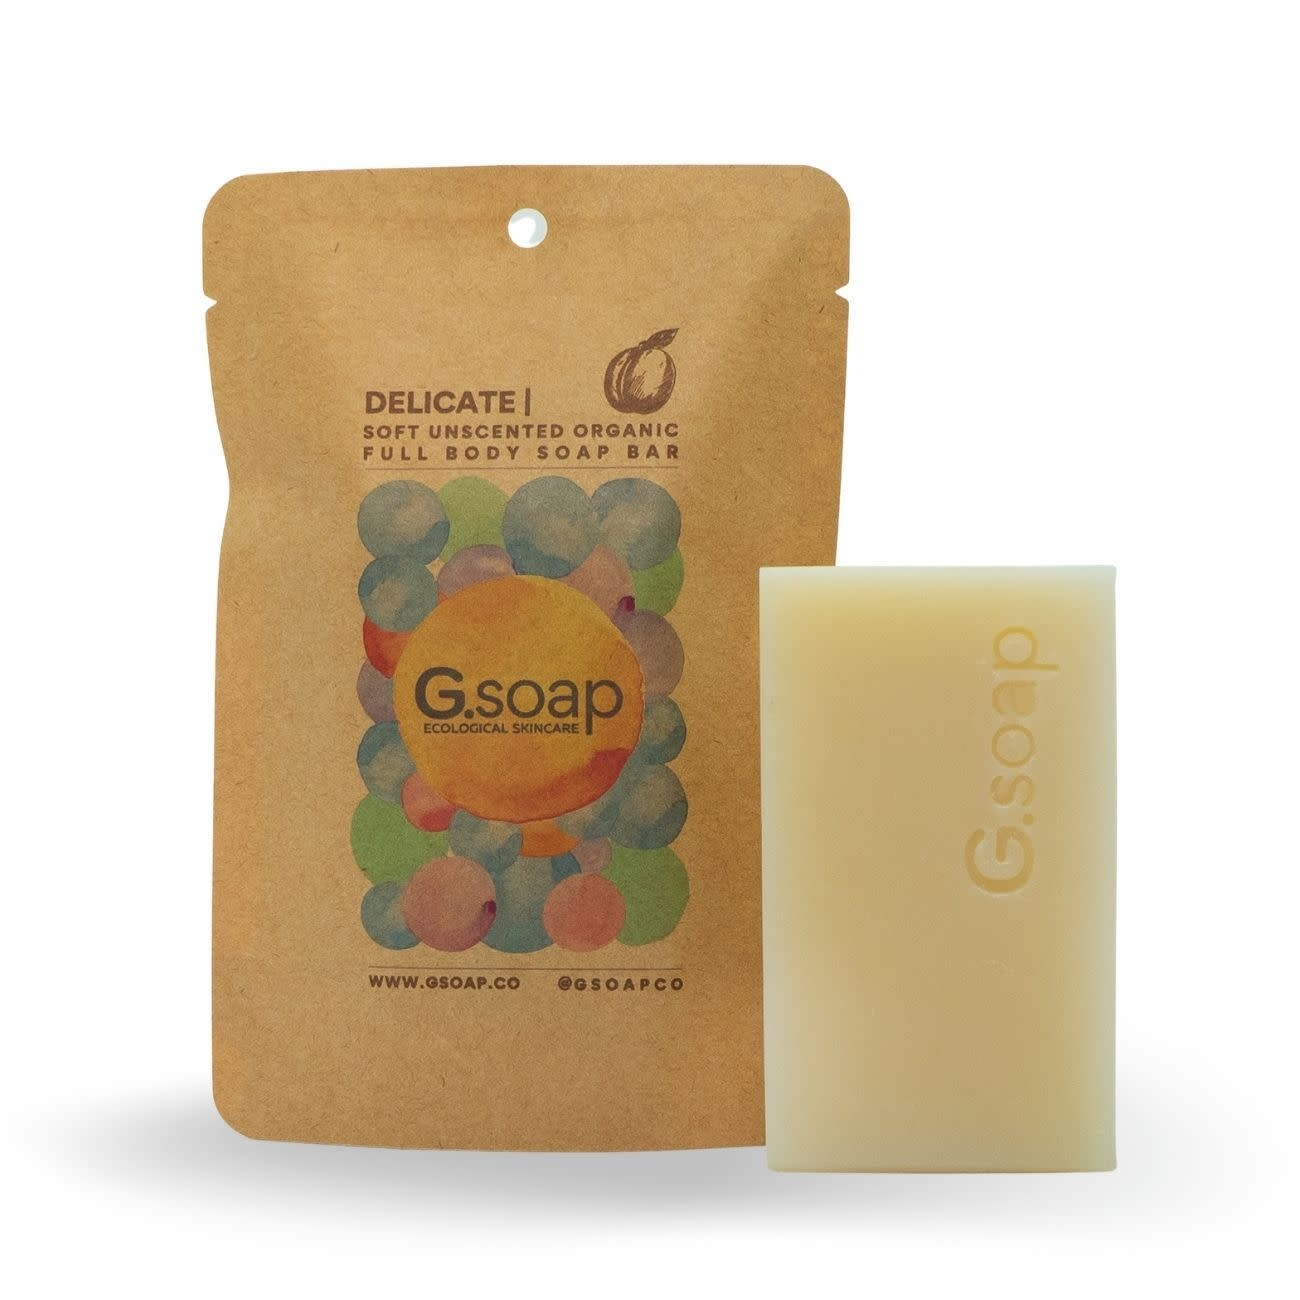 G.soap G.soap DELICATE Soap Bar